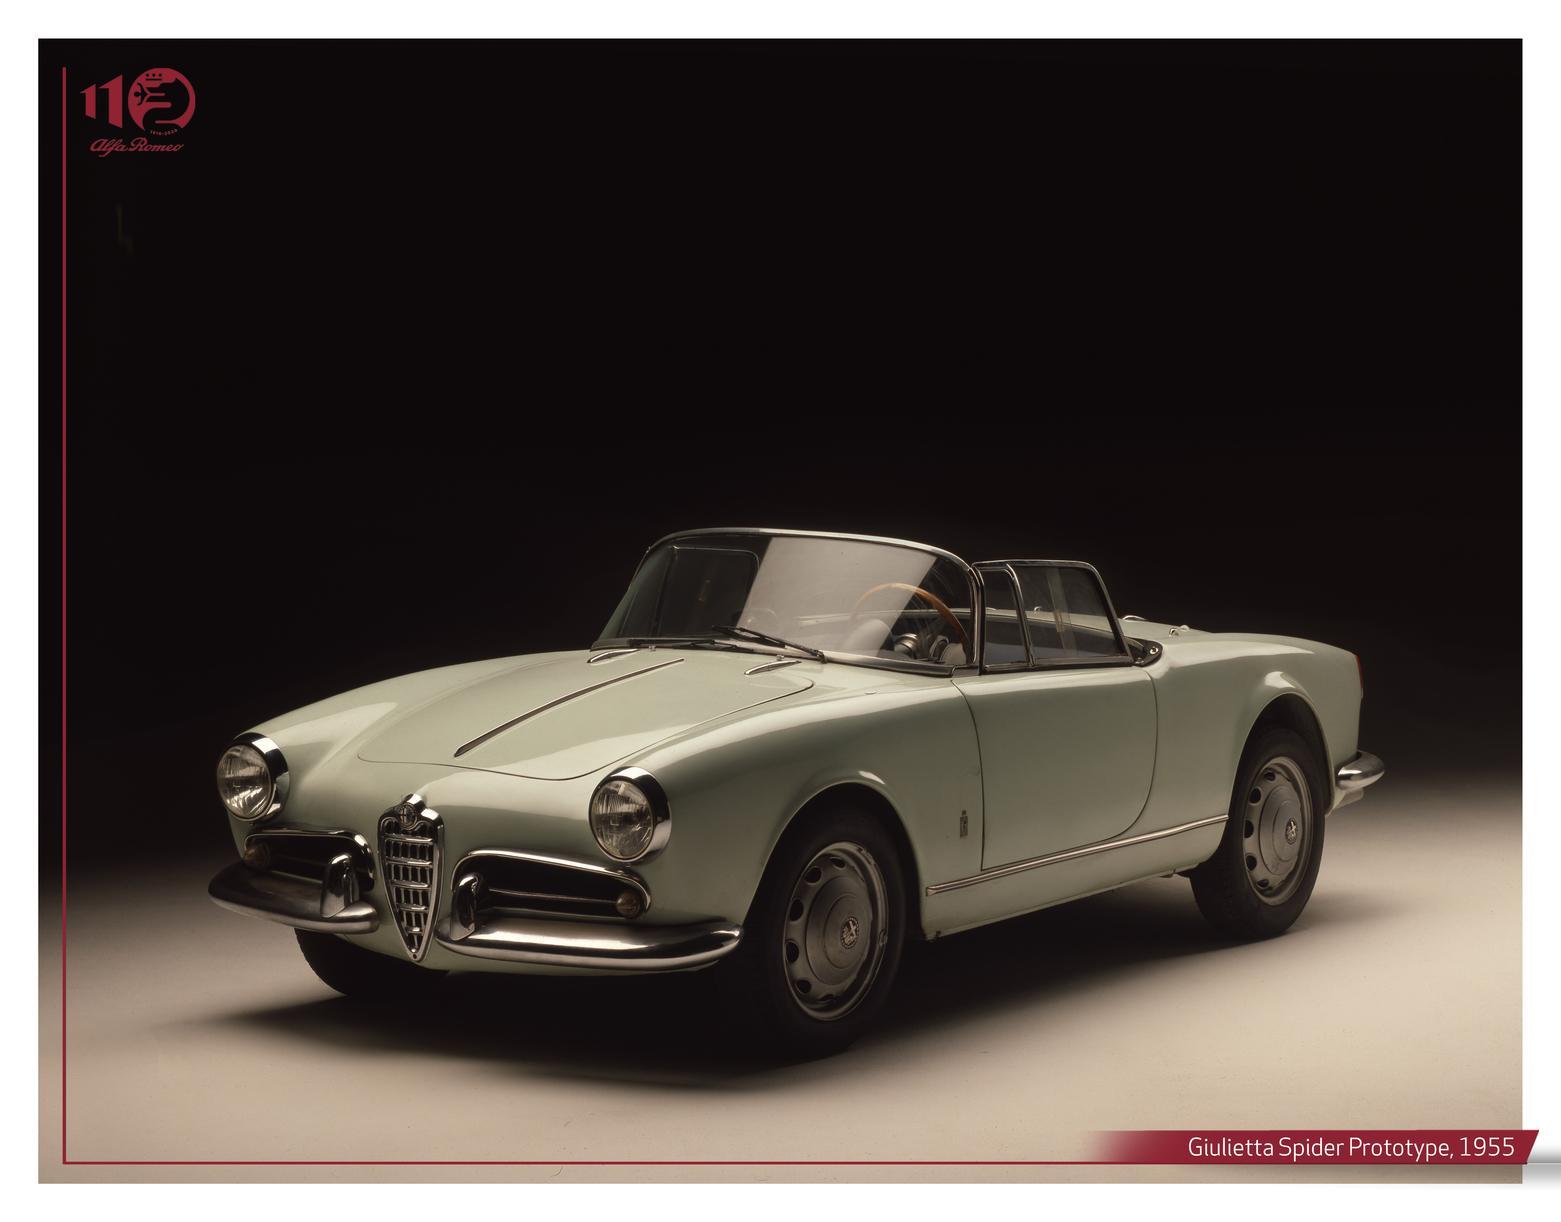 rsz_giulietta-spider-prototype1955_eng.jpg